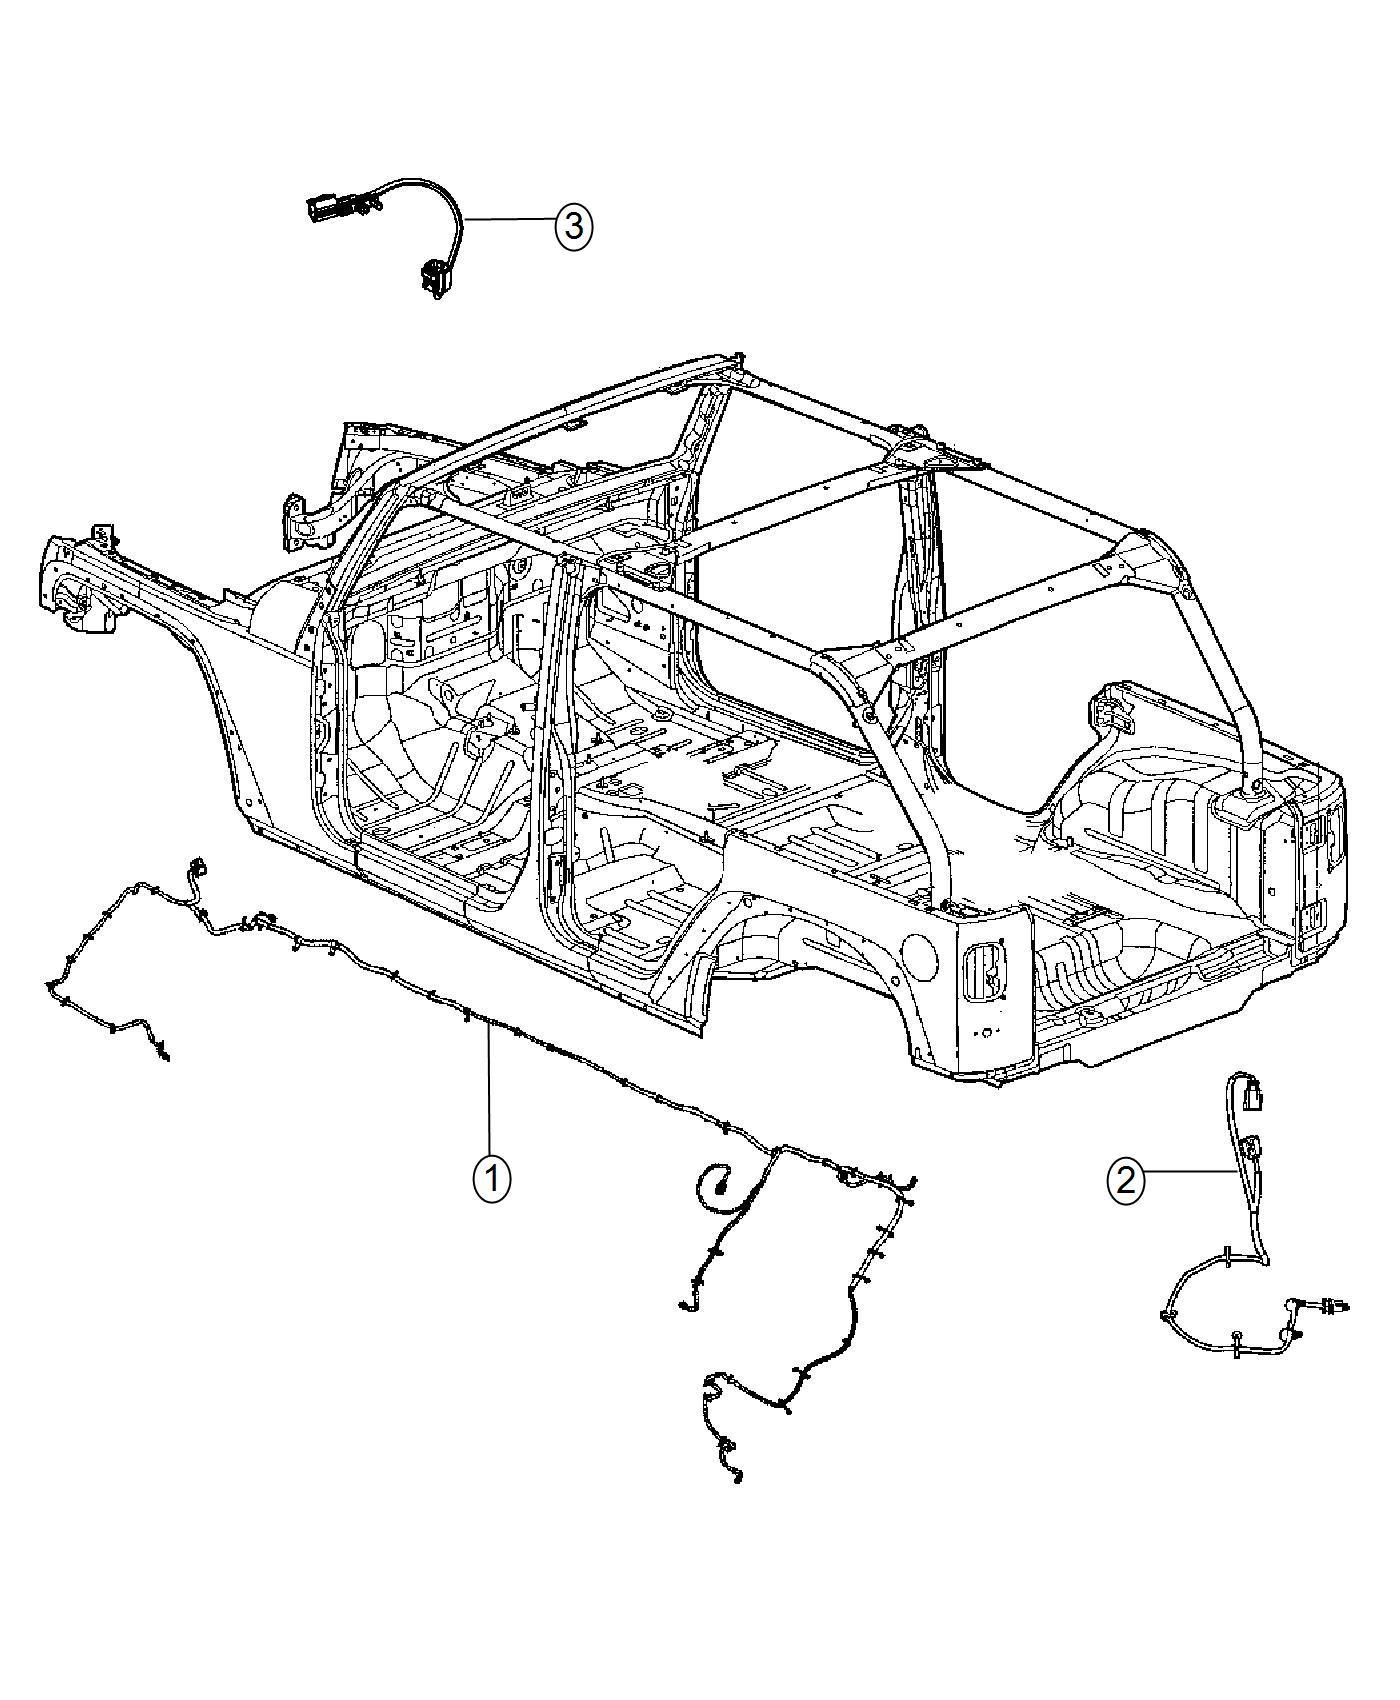 Jeep Wrangler Wiring Chassis Locker Rear Axle